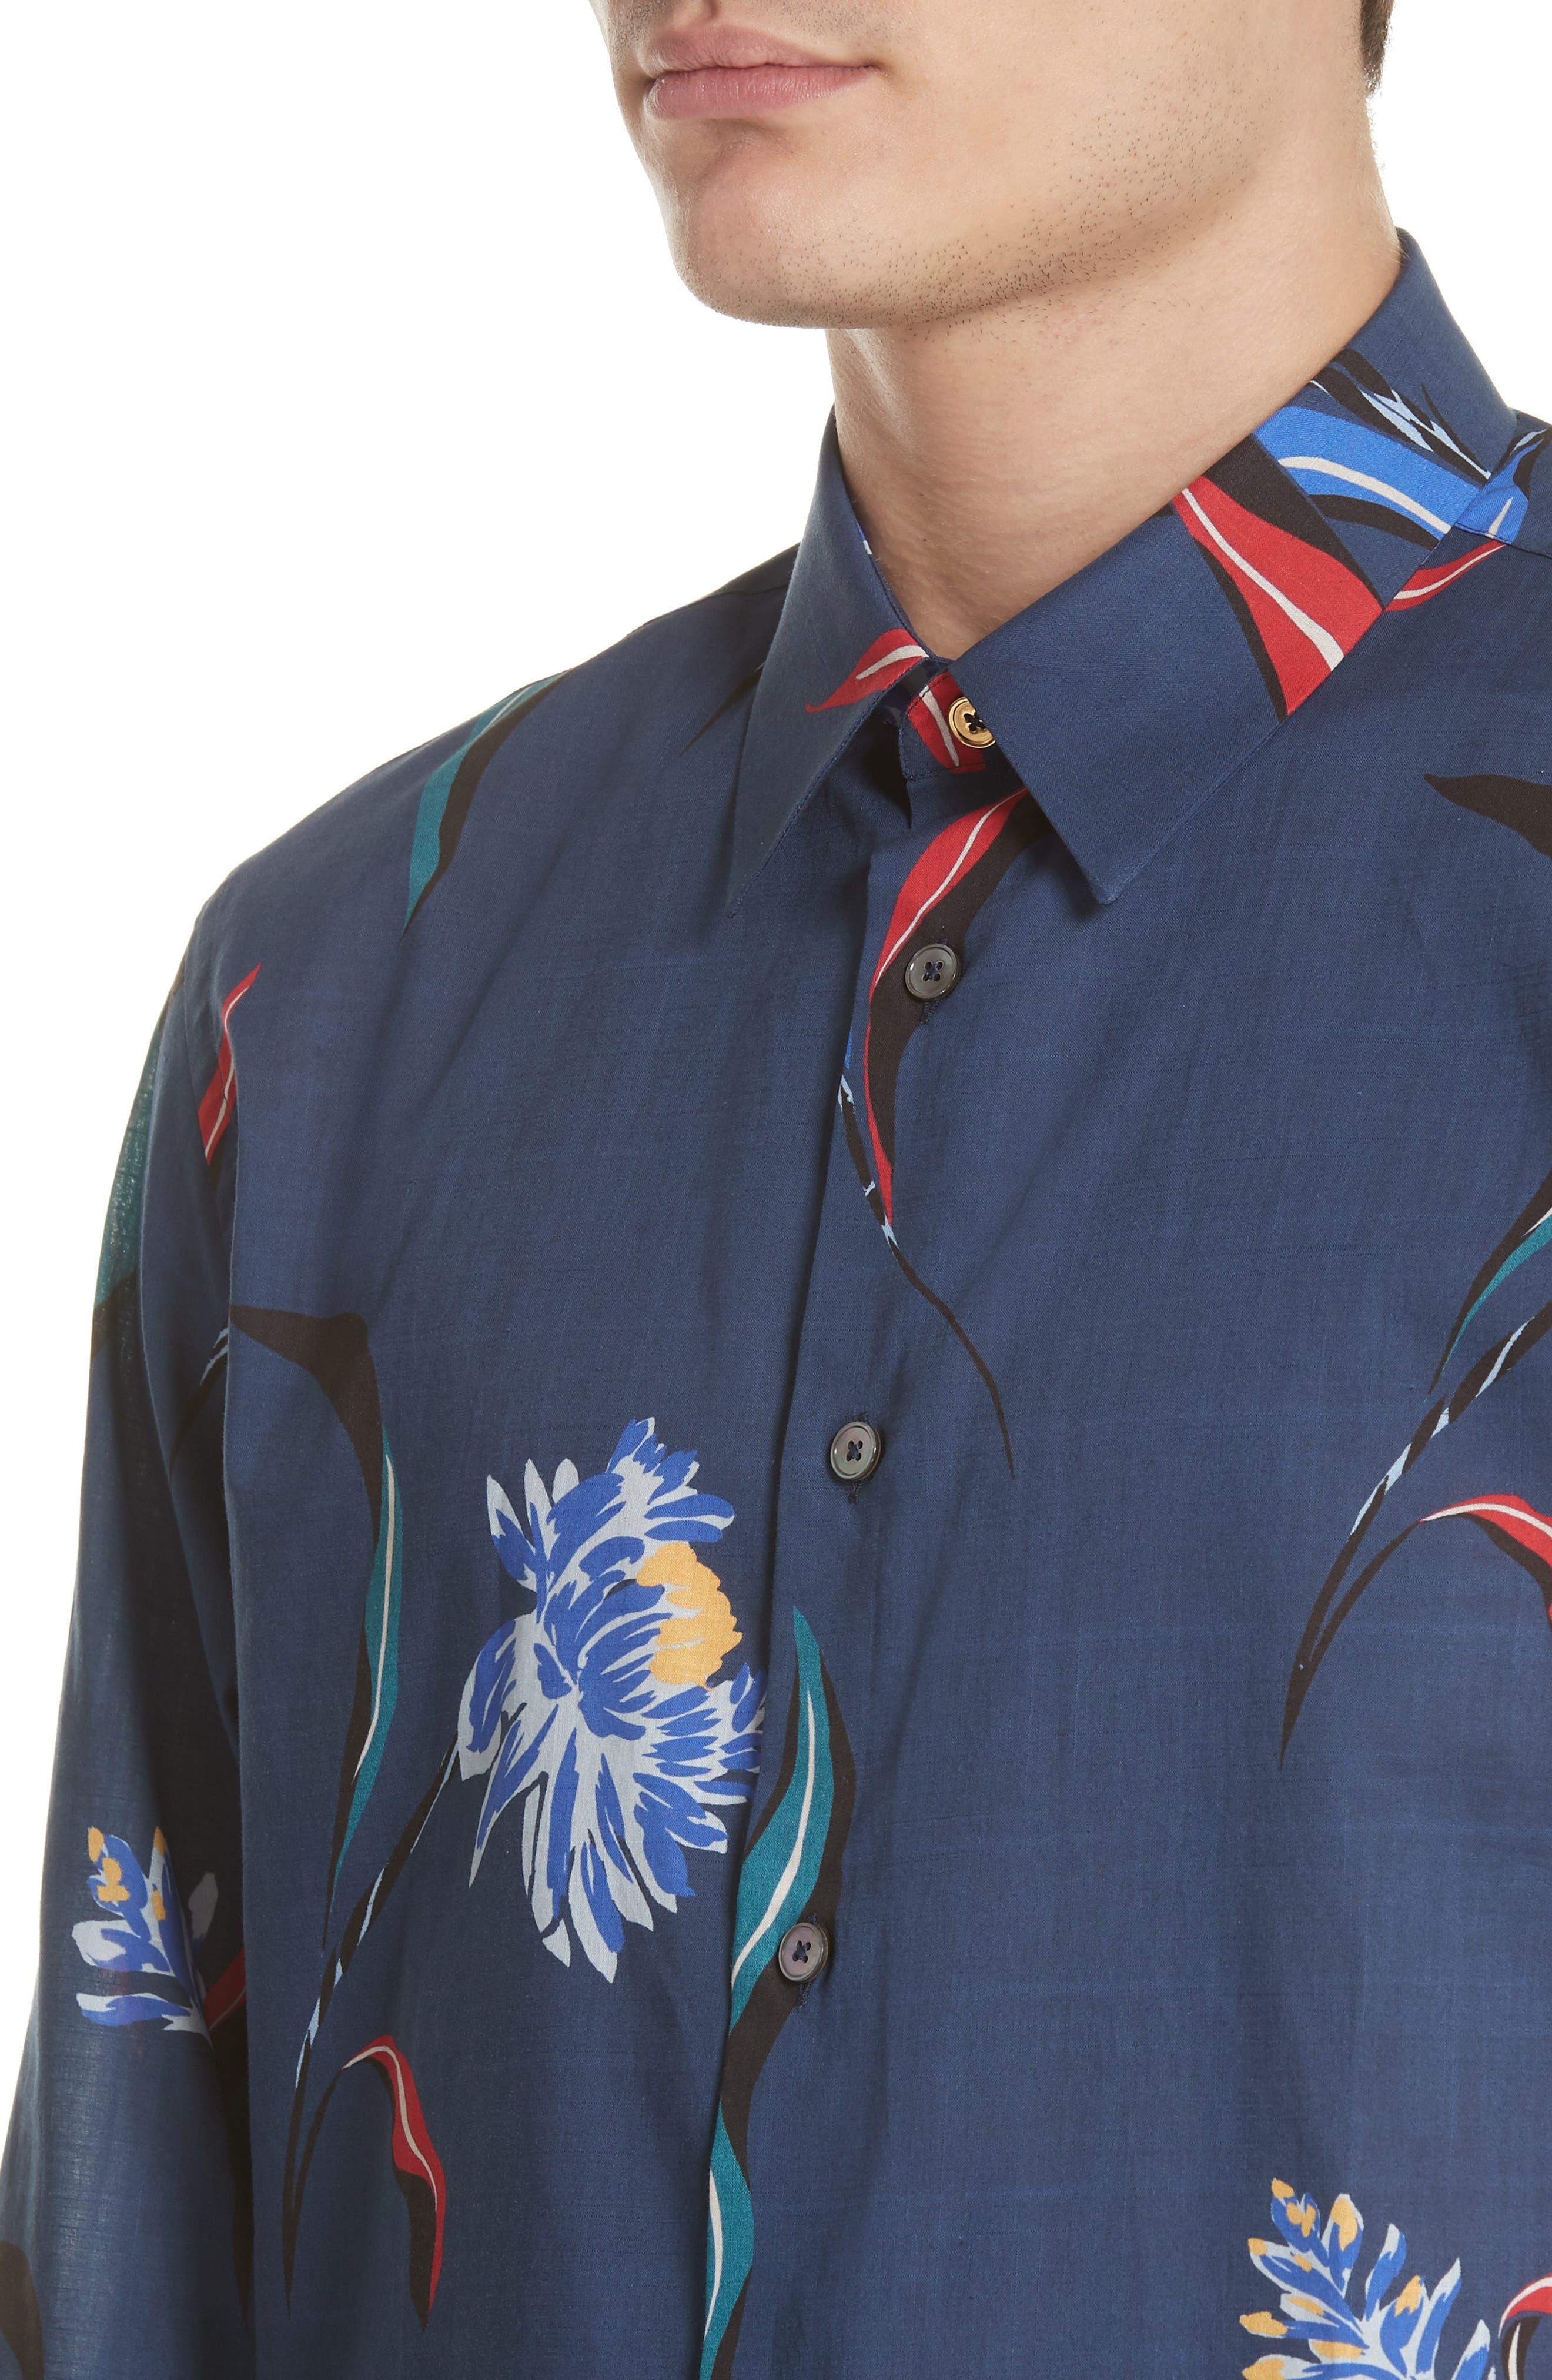 Floral Woven Shirt,                             Alternate thumbnail 4, color,                             415